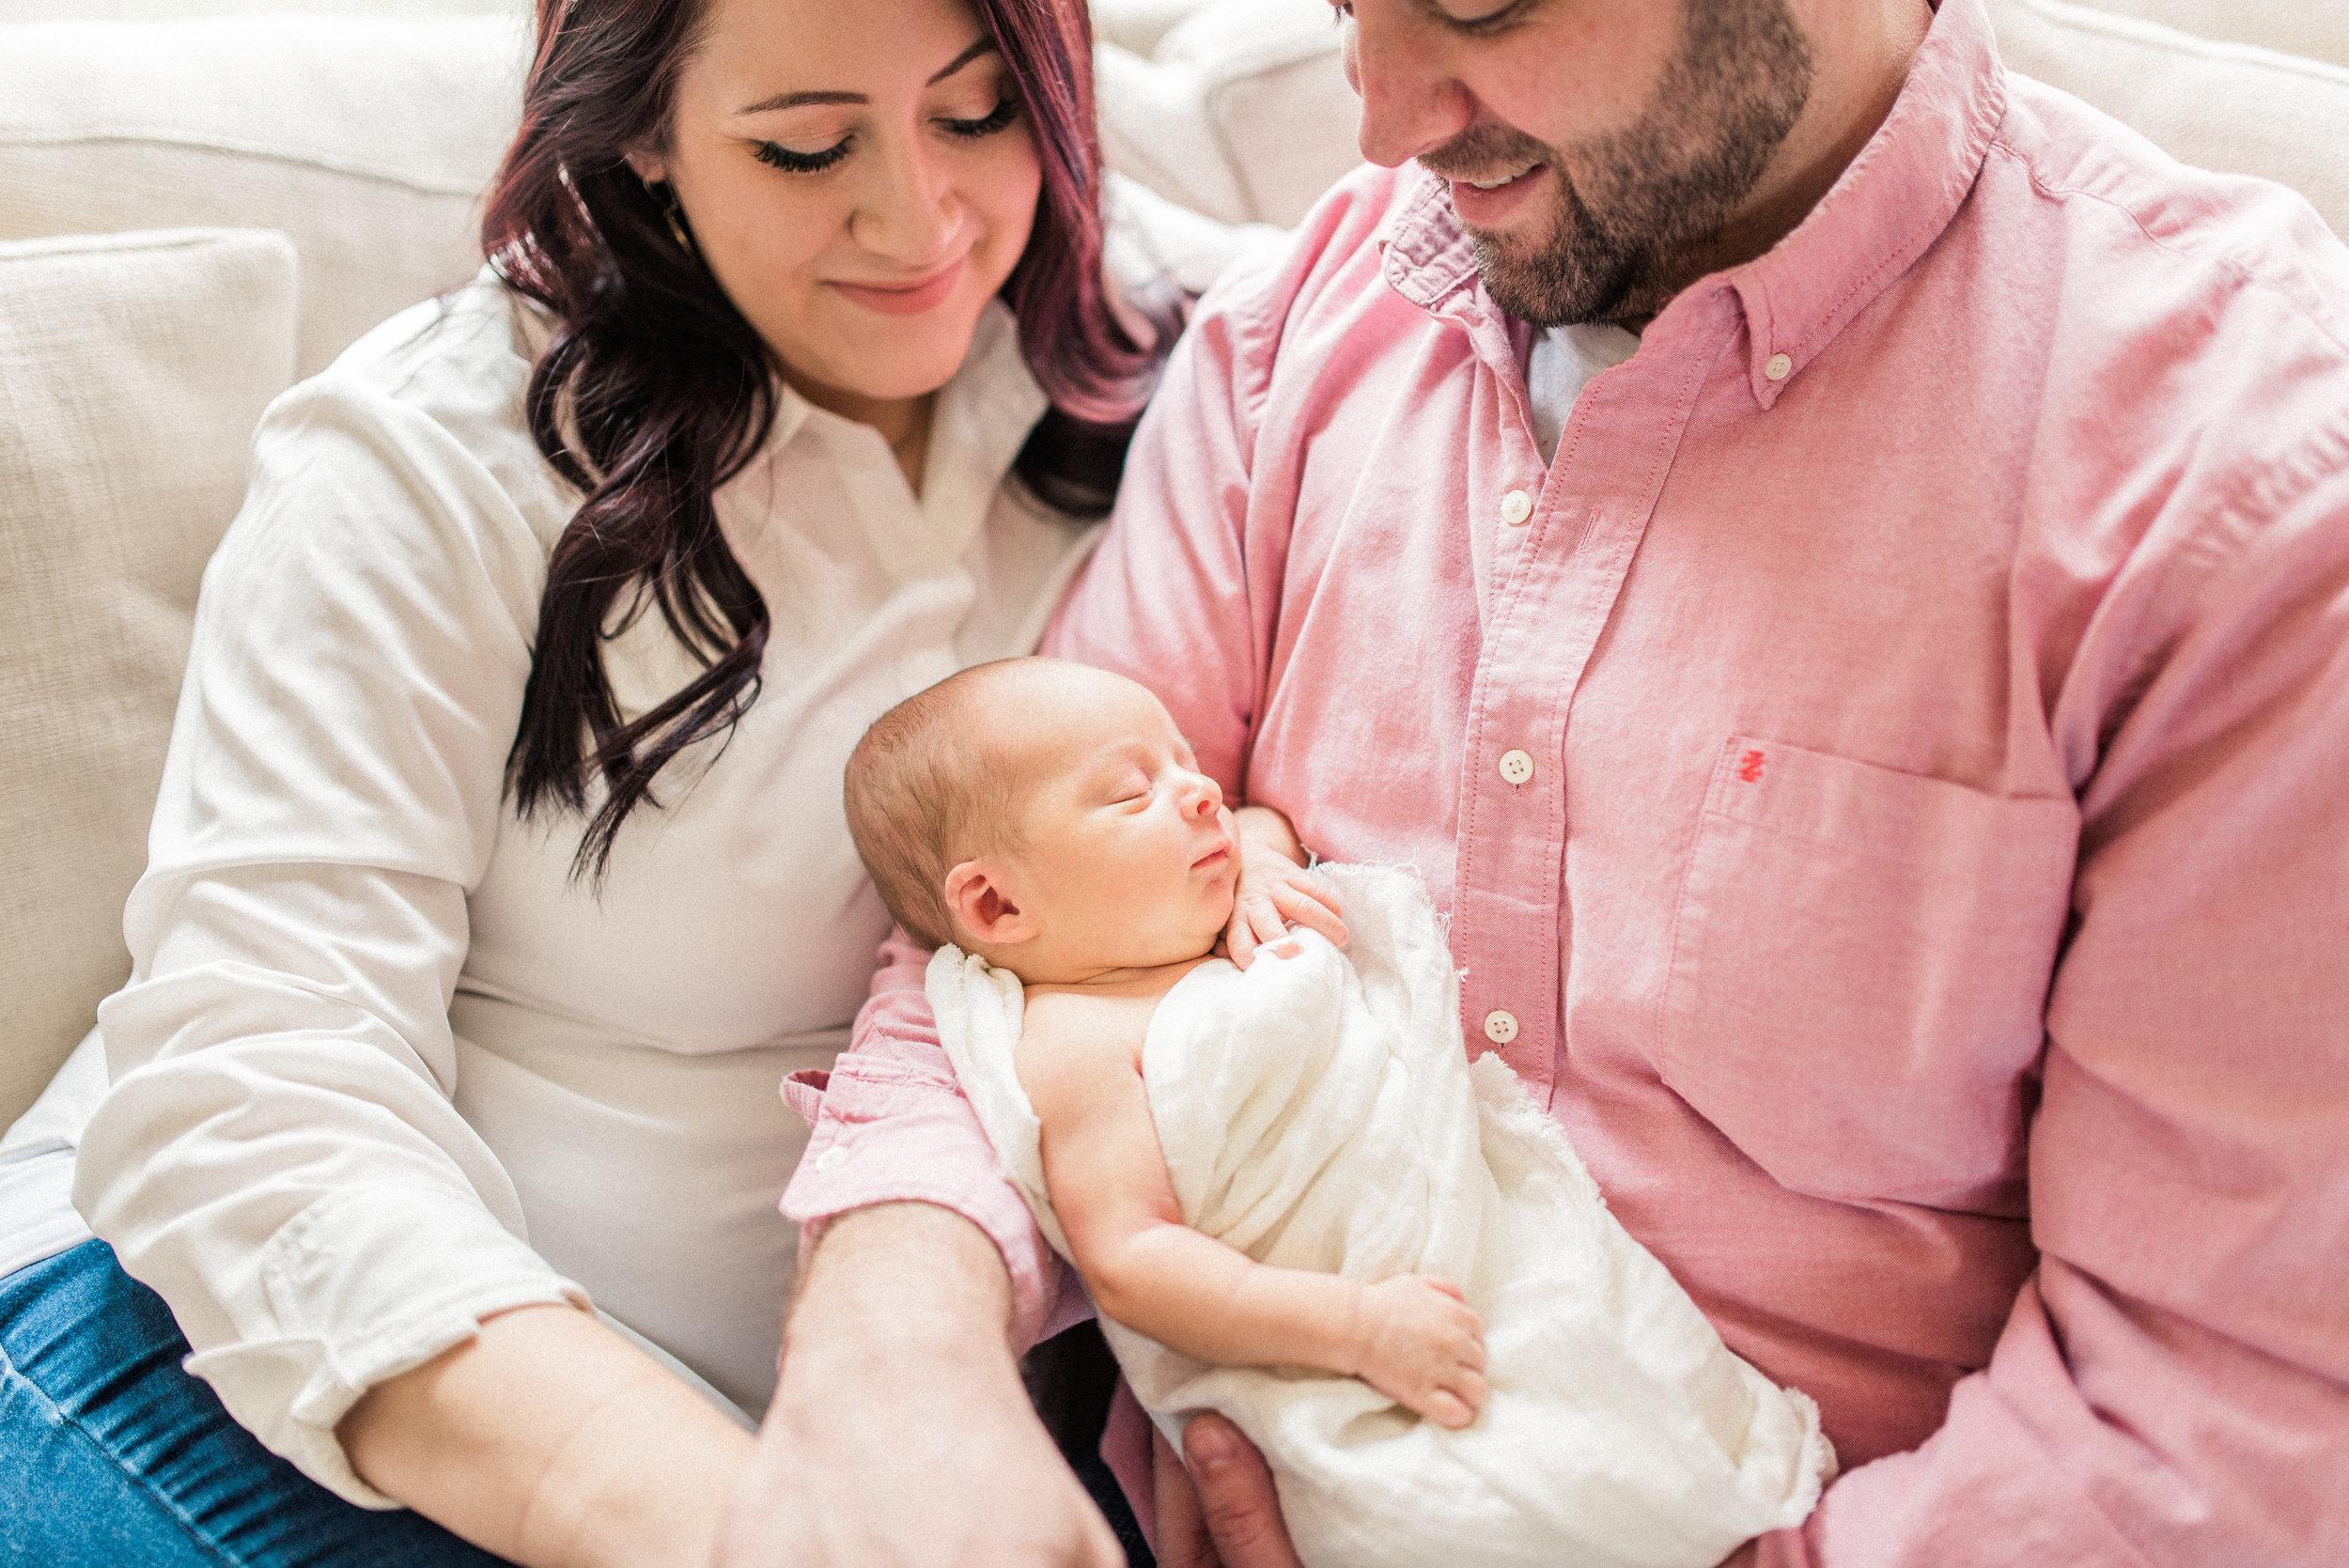 Brynna | Sentimental & Sweet Newborn Photography | Noblesville, IN